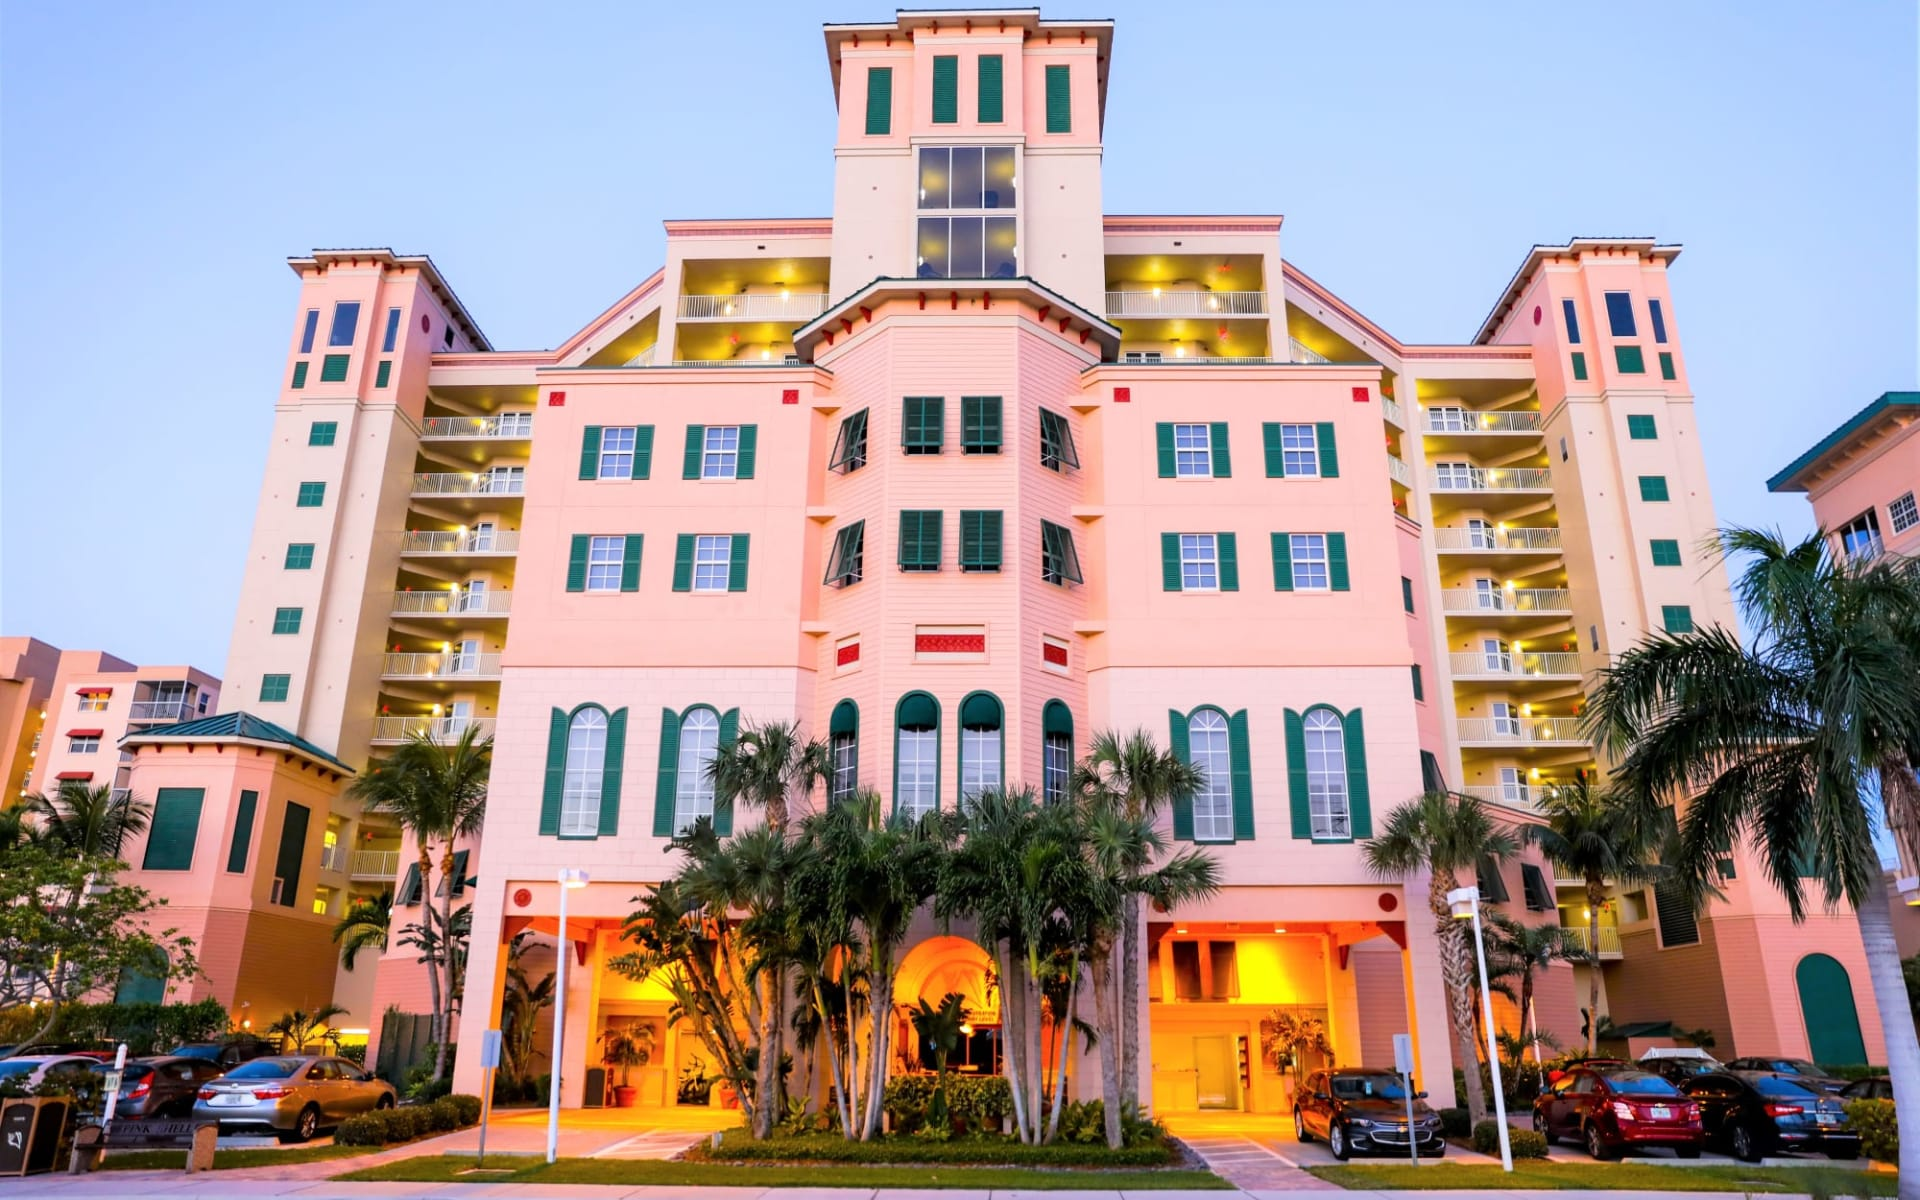 Pink Shell Beach Resort in Fort Myers:  Pink Shell Beach Resort - Exterior